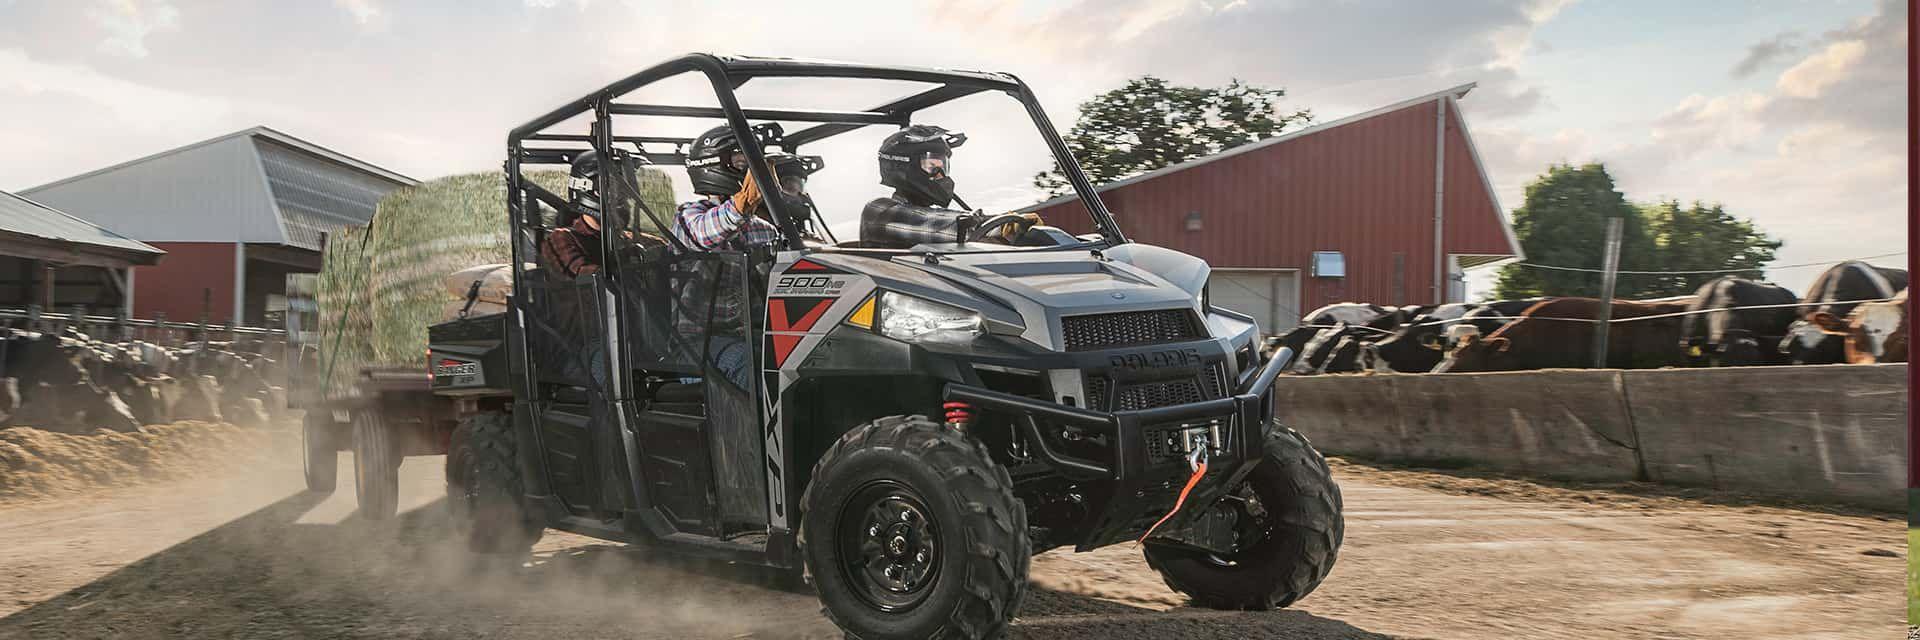 Explore the Polaris Ranger Crew Utility Vehicle at Jan-Cen Motor Sports